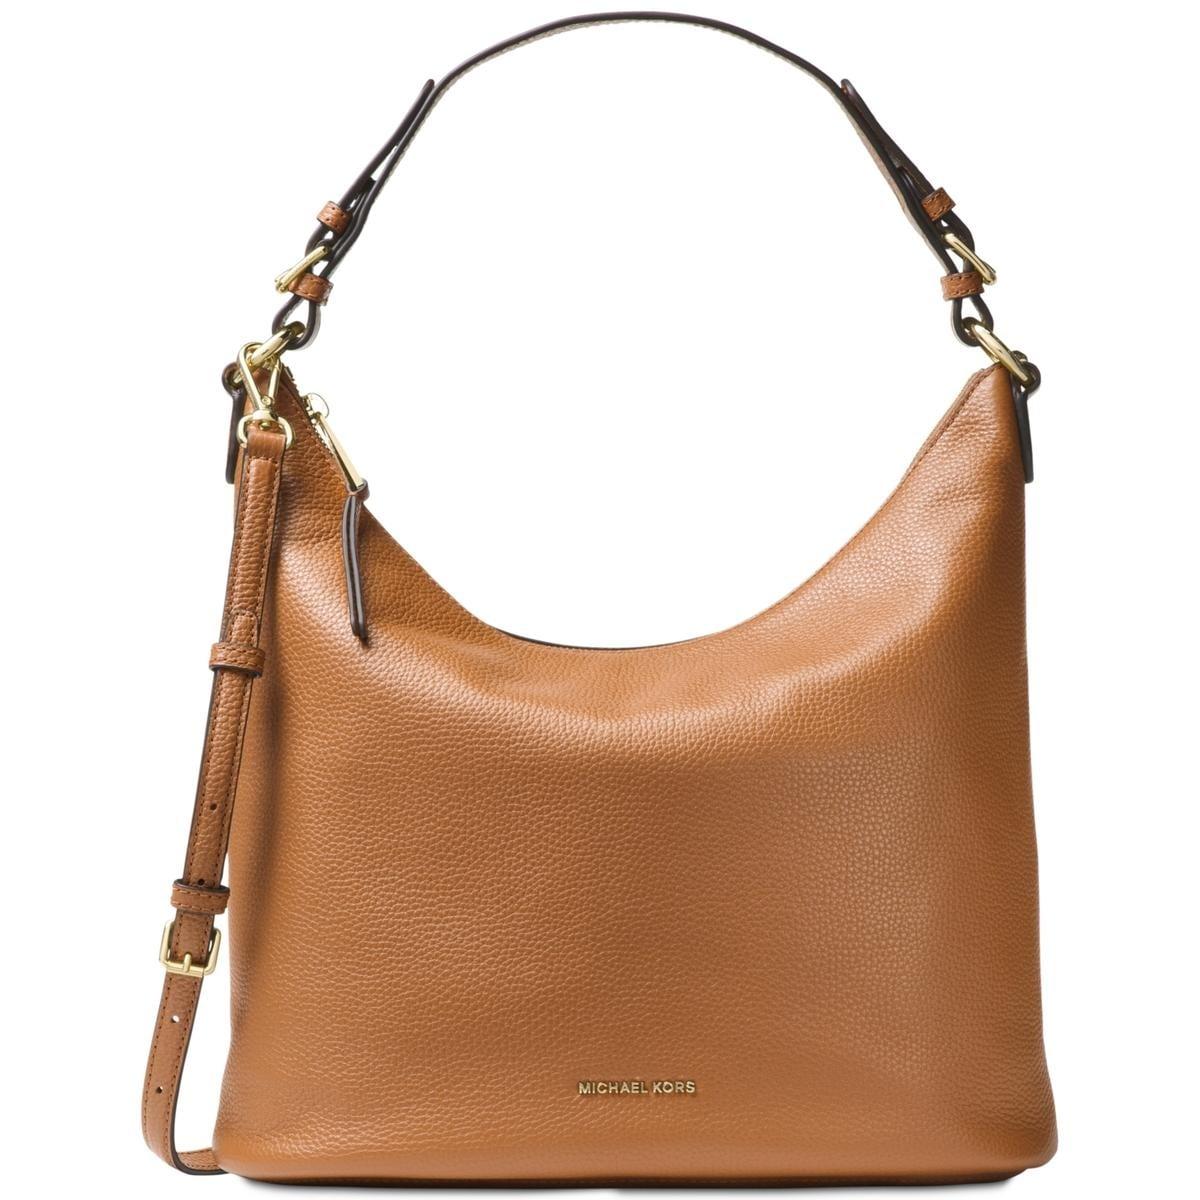 dc851d51bade Shop MICHAEL Michael Kors Womens Lupita Hobo Handbag Leather Pebbled -  LARGE - Free Shipping Today - Overstock - 22679135